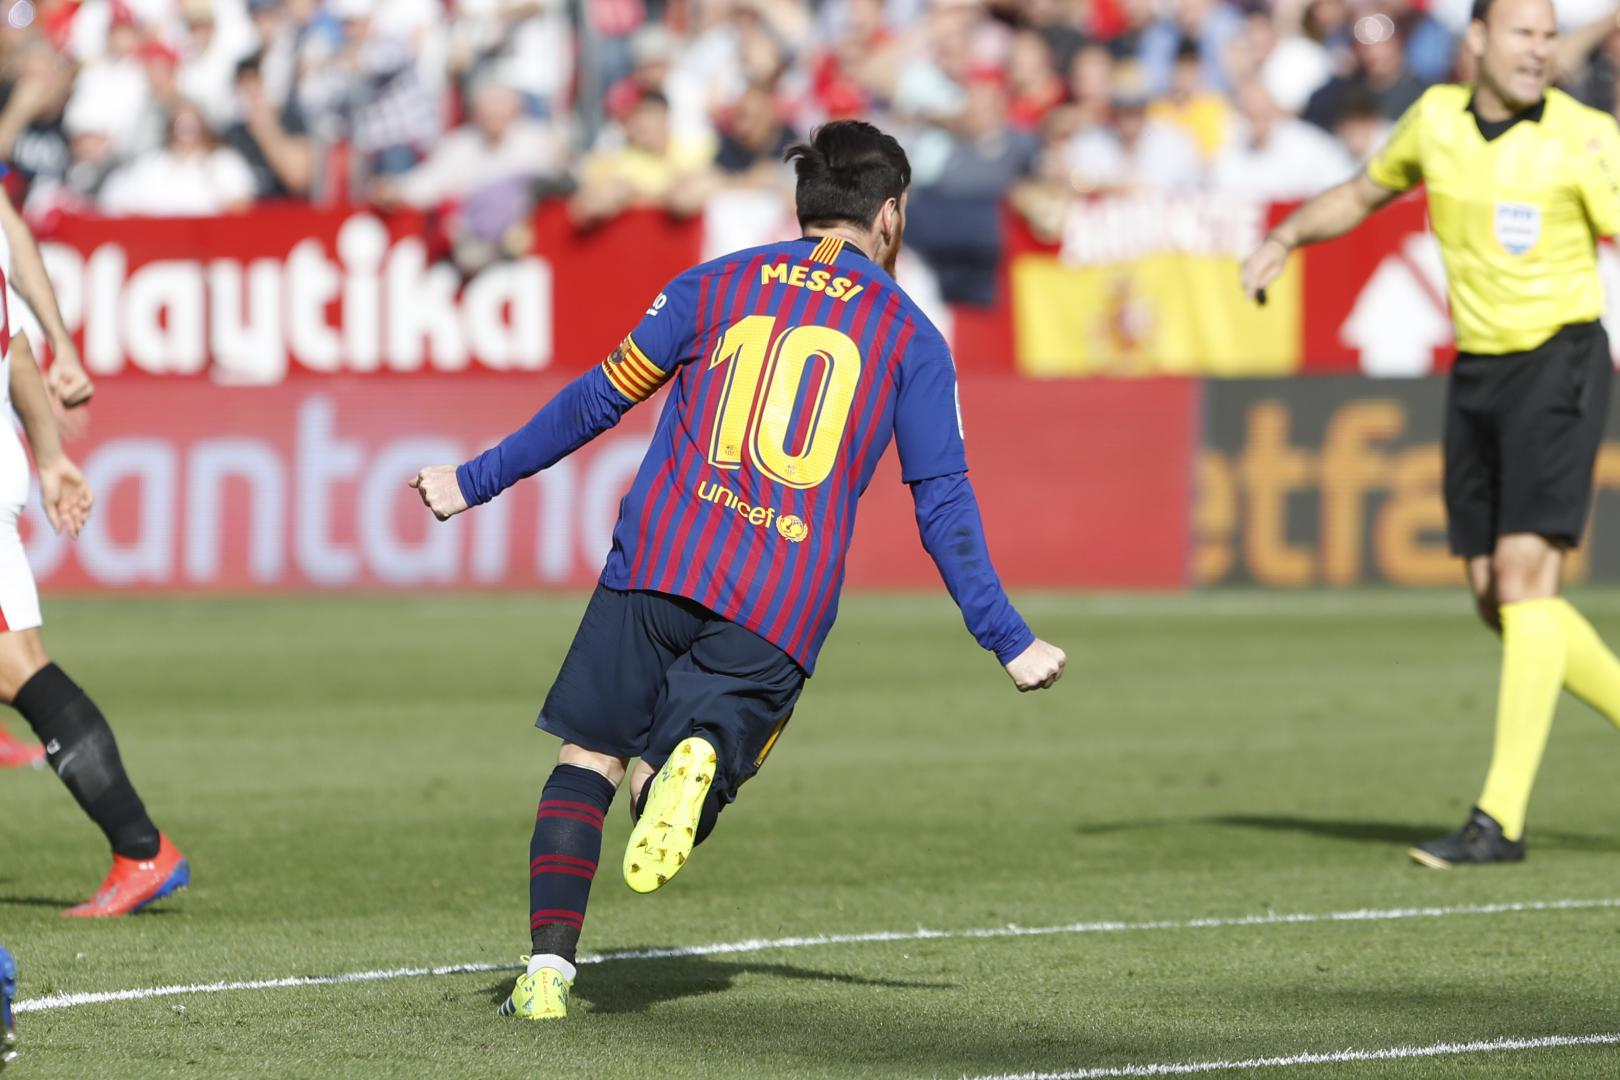 Messi Sevilla